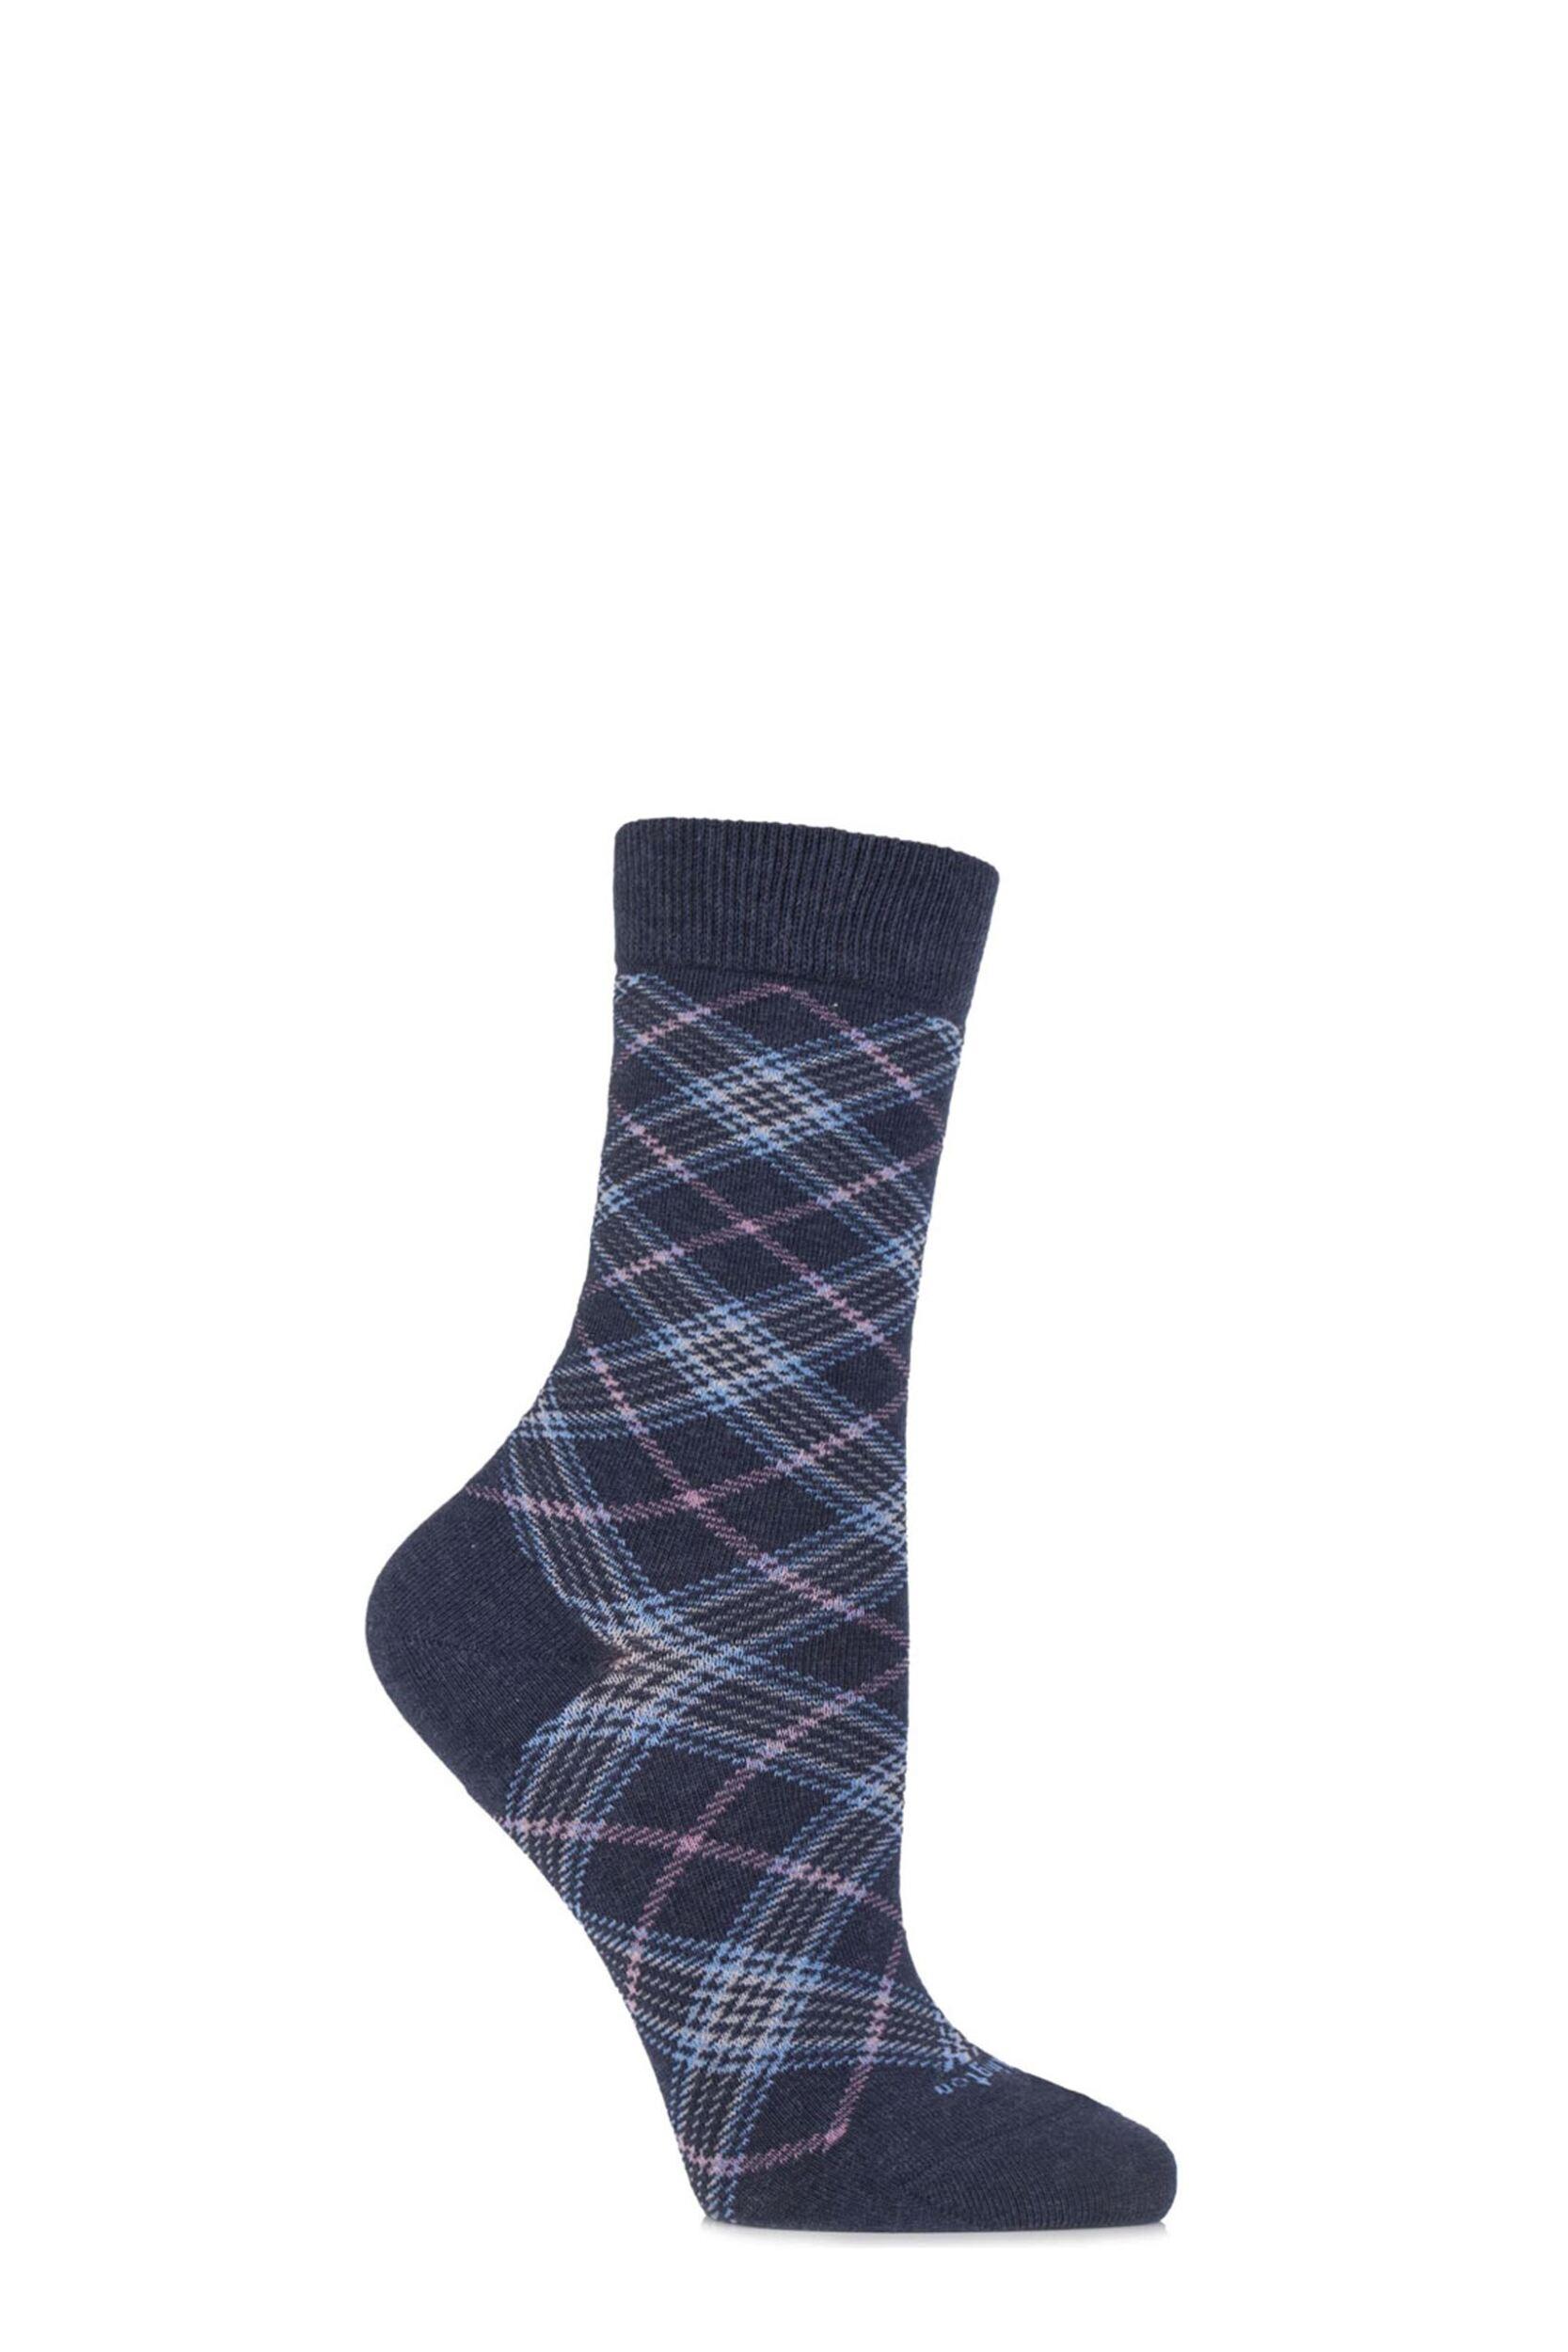 Ladies-1-Pair-Burlington-Shoreditch-Cotton-Tartan-Socks